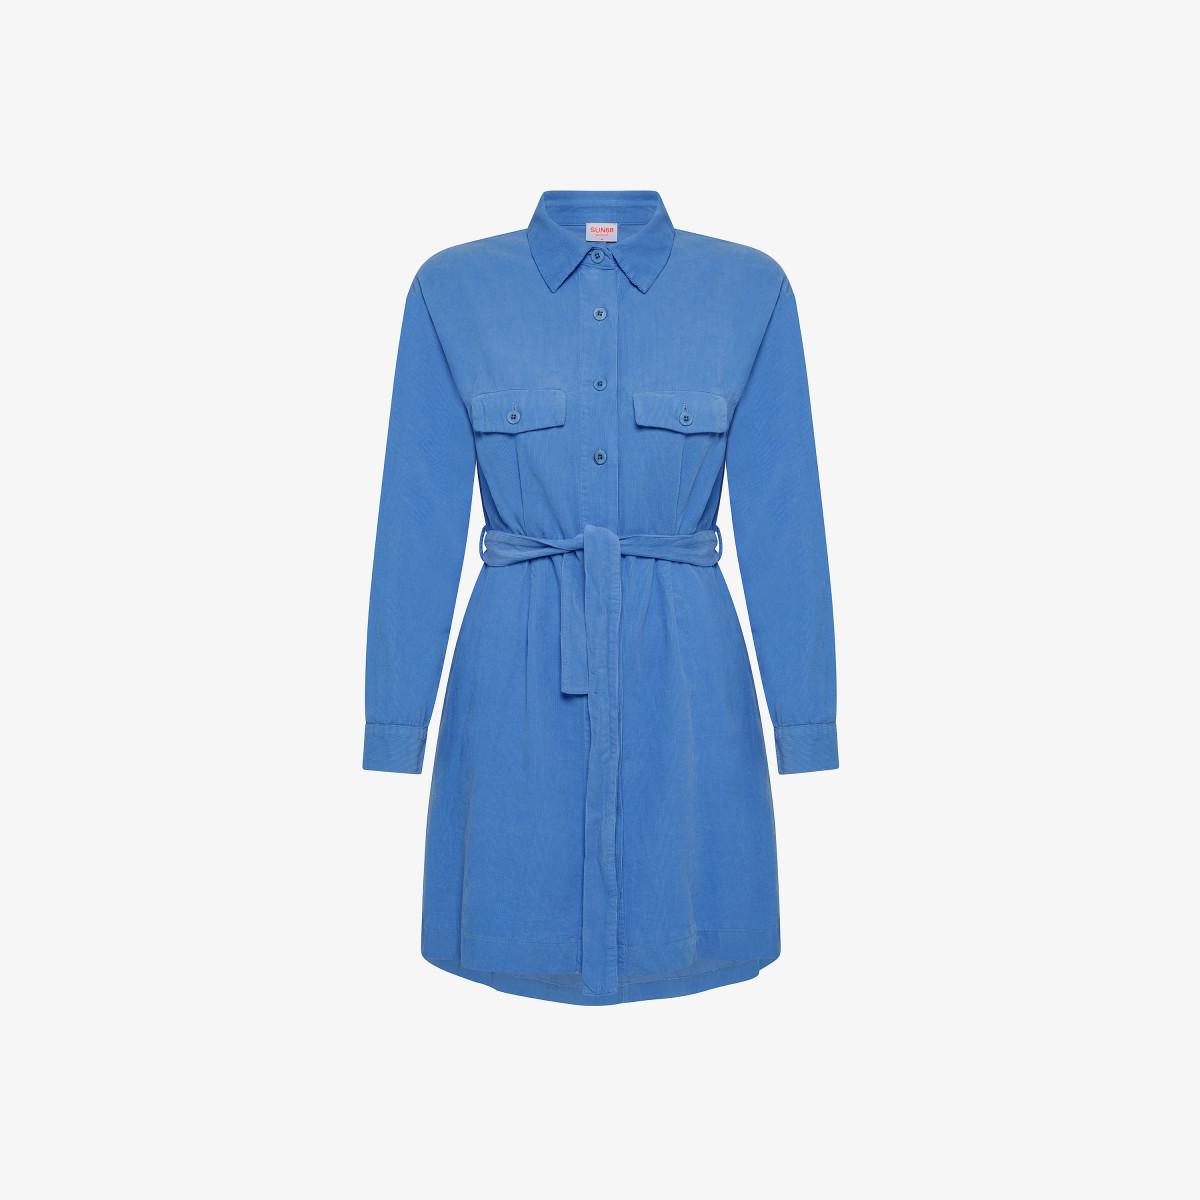 CHEMISIER DRESS L/S BLUE